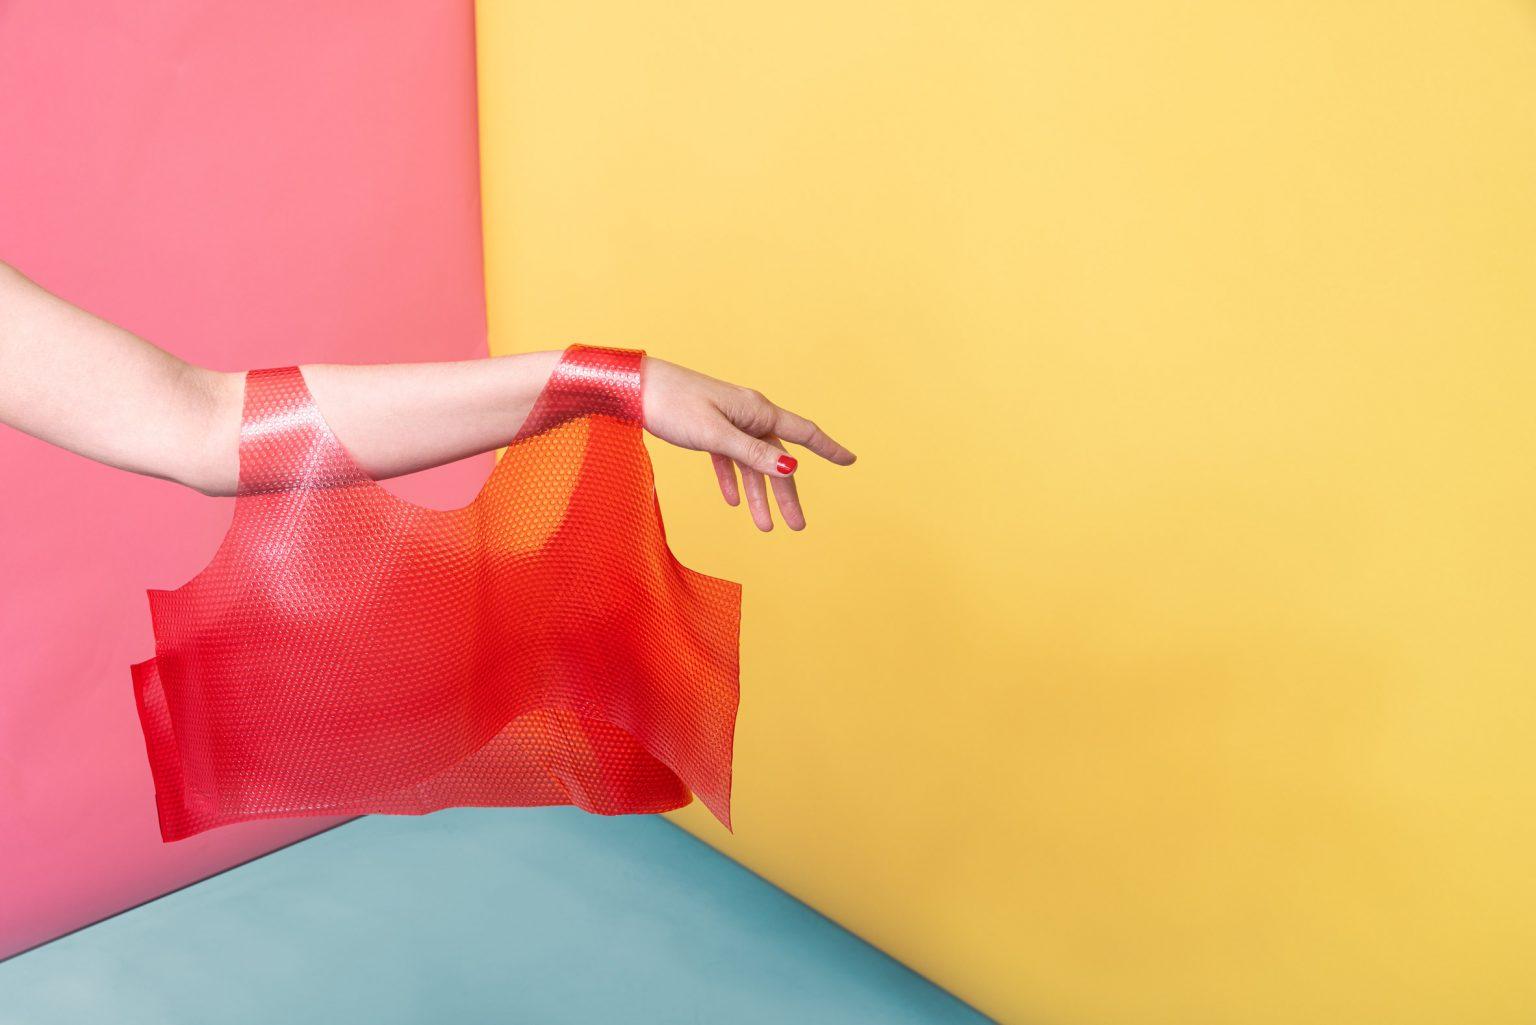 🤤 Dyzajnerka stvoryla odjag iz žele — jogo možna pererobyty za vlasnym bažannjam